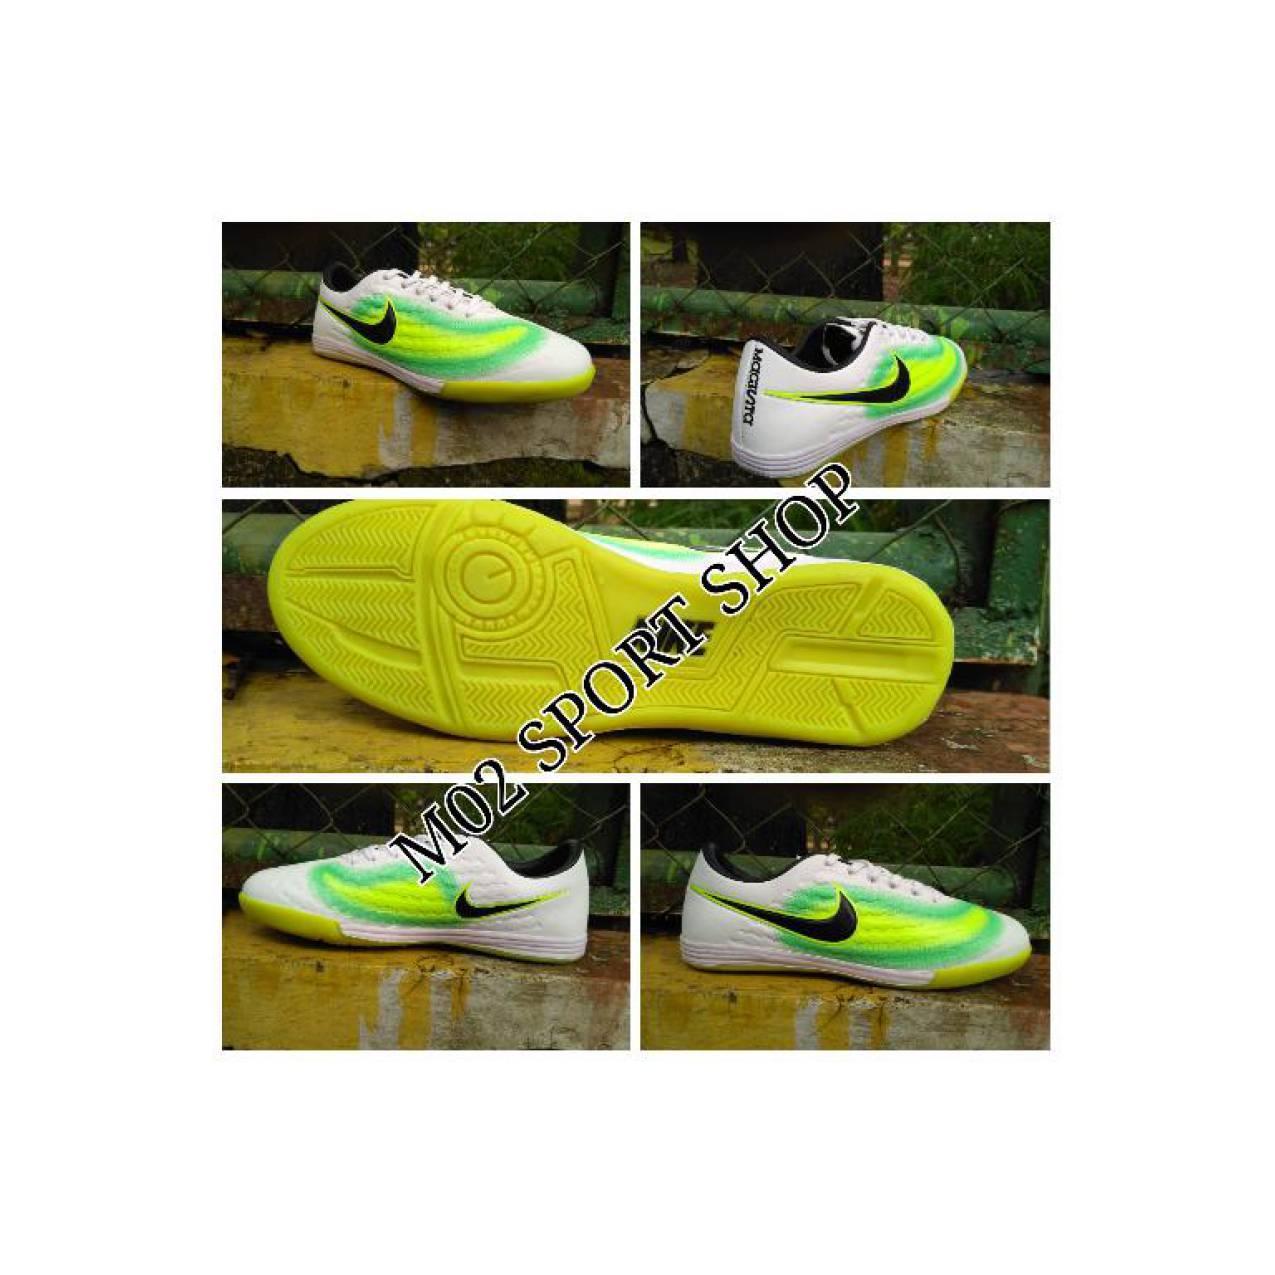 Sepatu futsal Nike magista putih list hitam sol karet